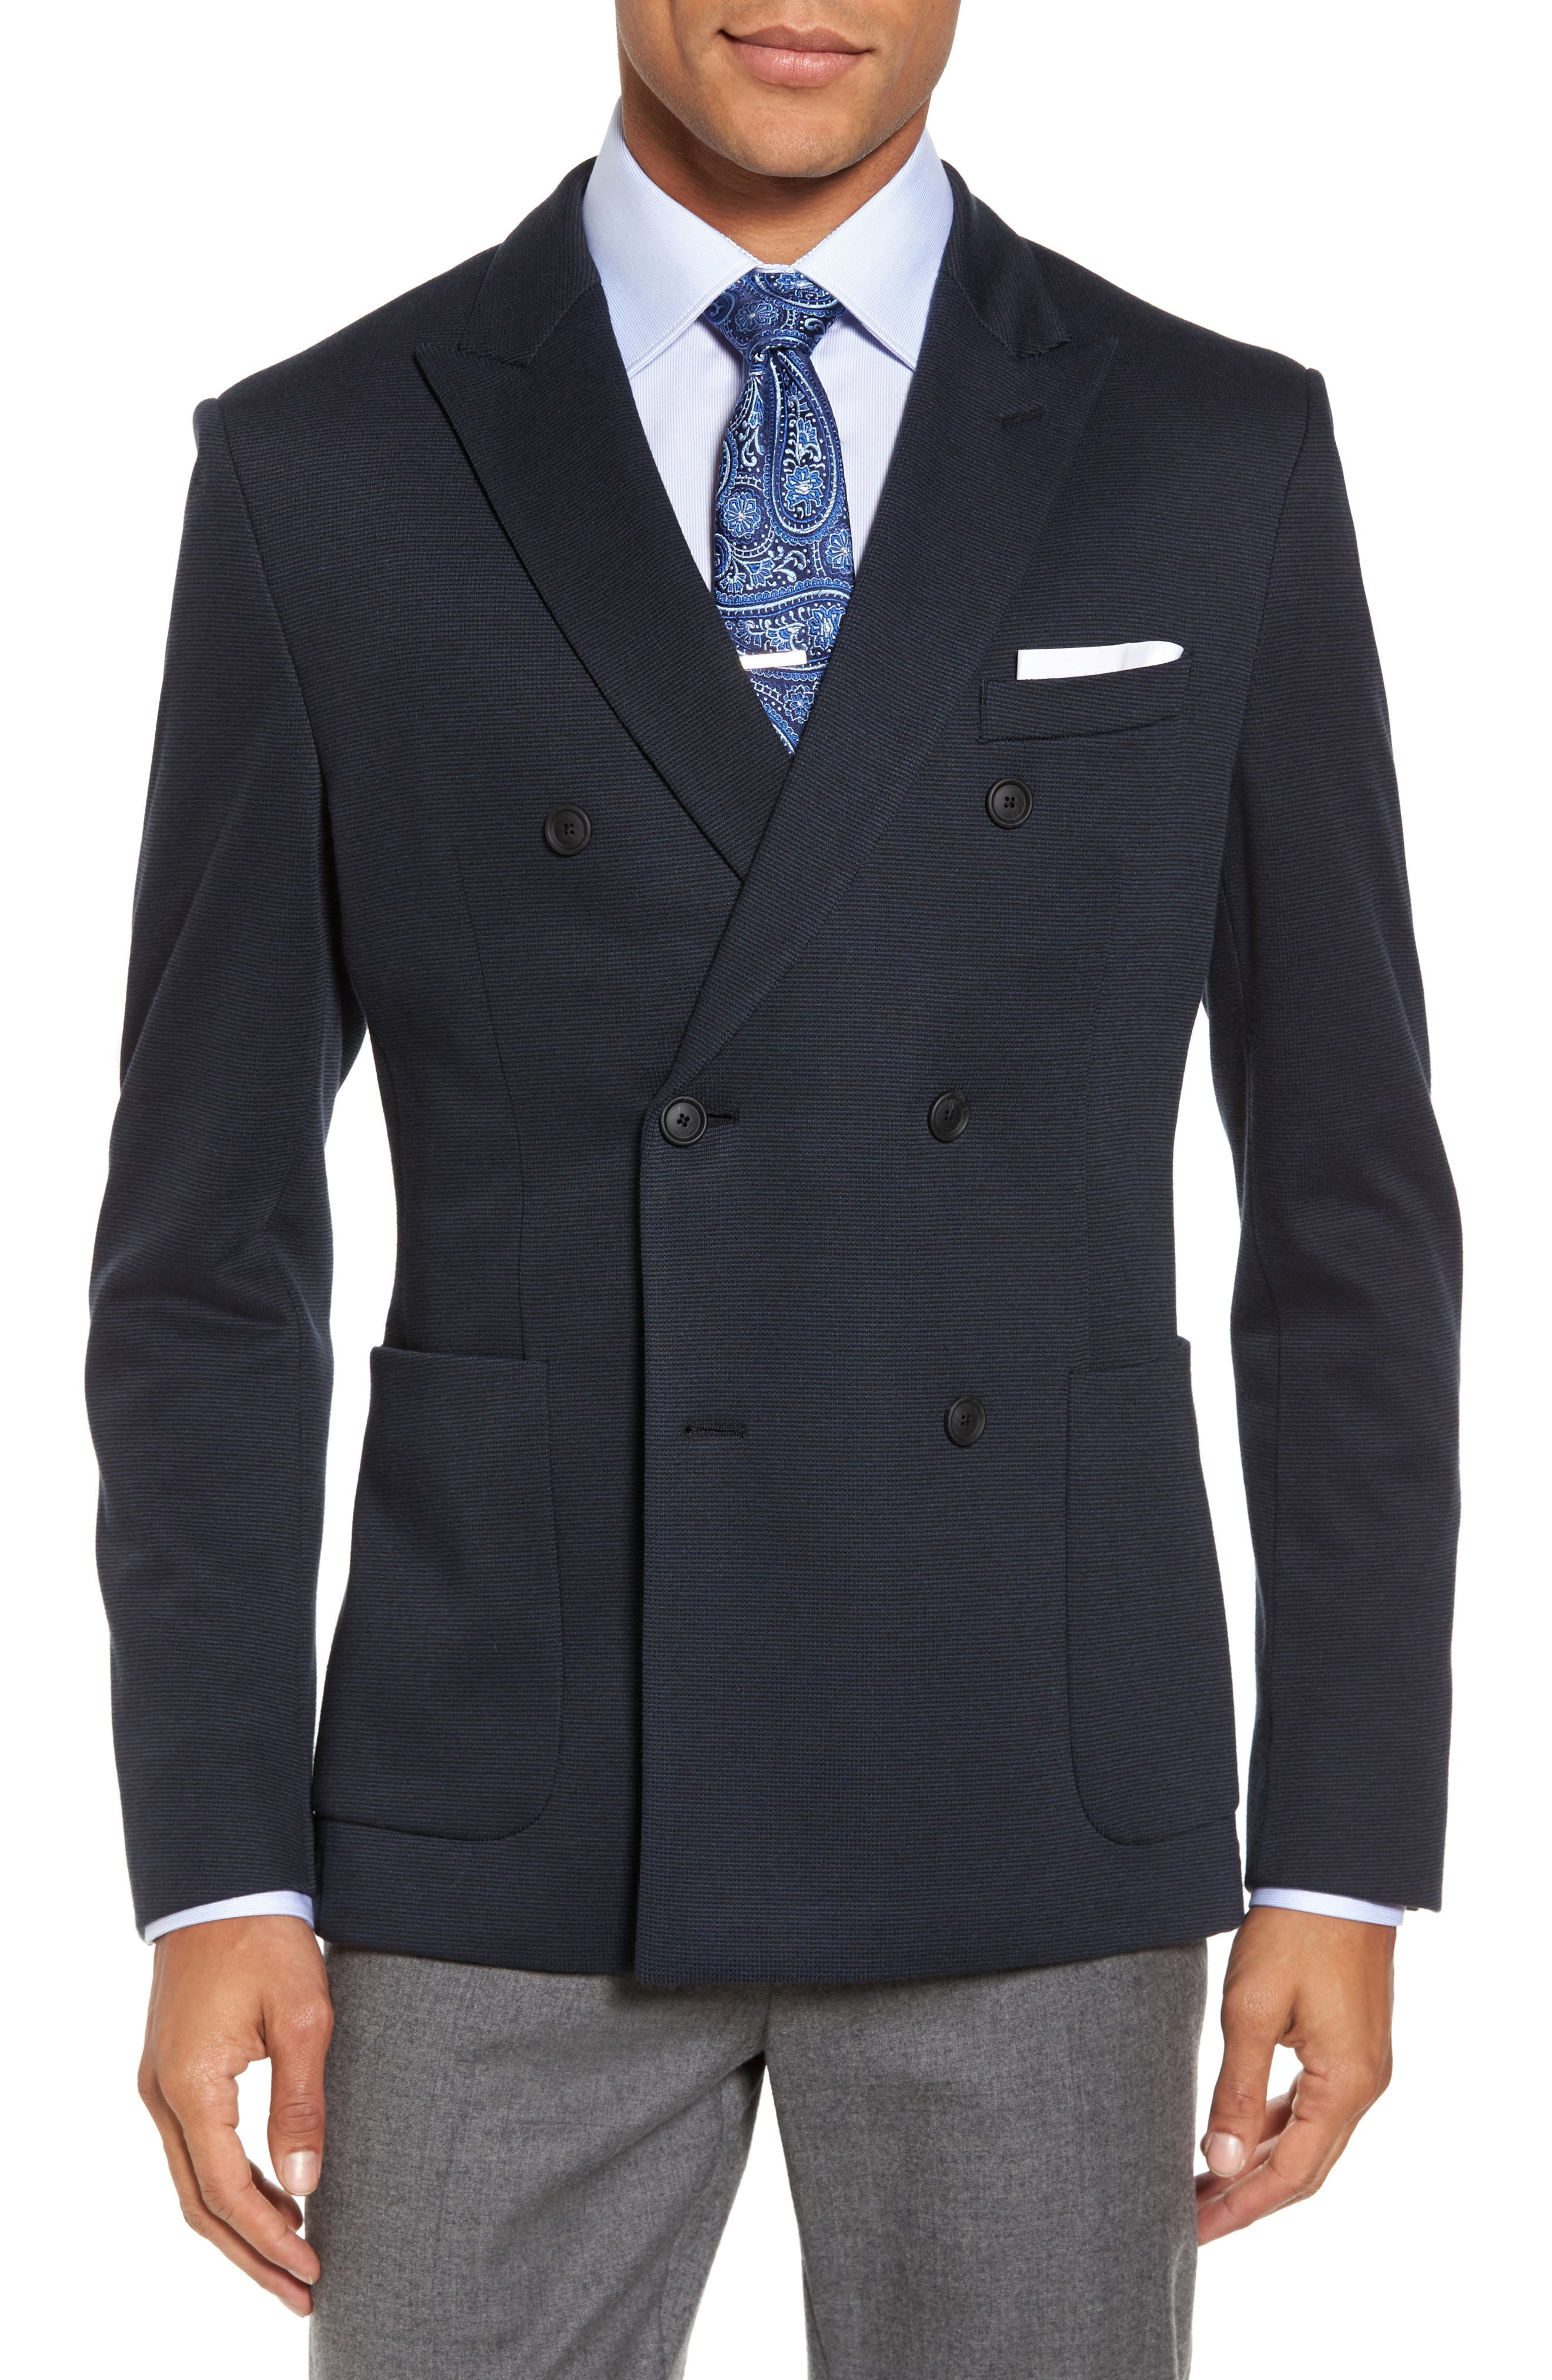 Alternate Image 1 Selected - BOSS Nayler-J Trim Fit Double-Breasted Blazer